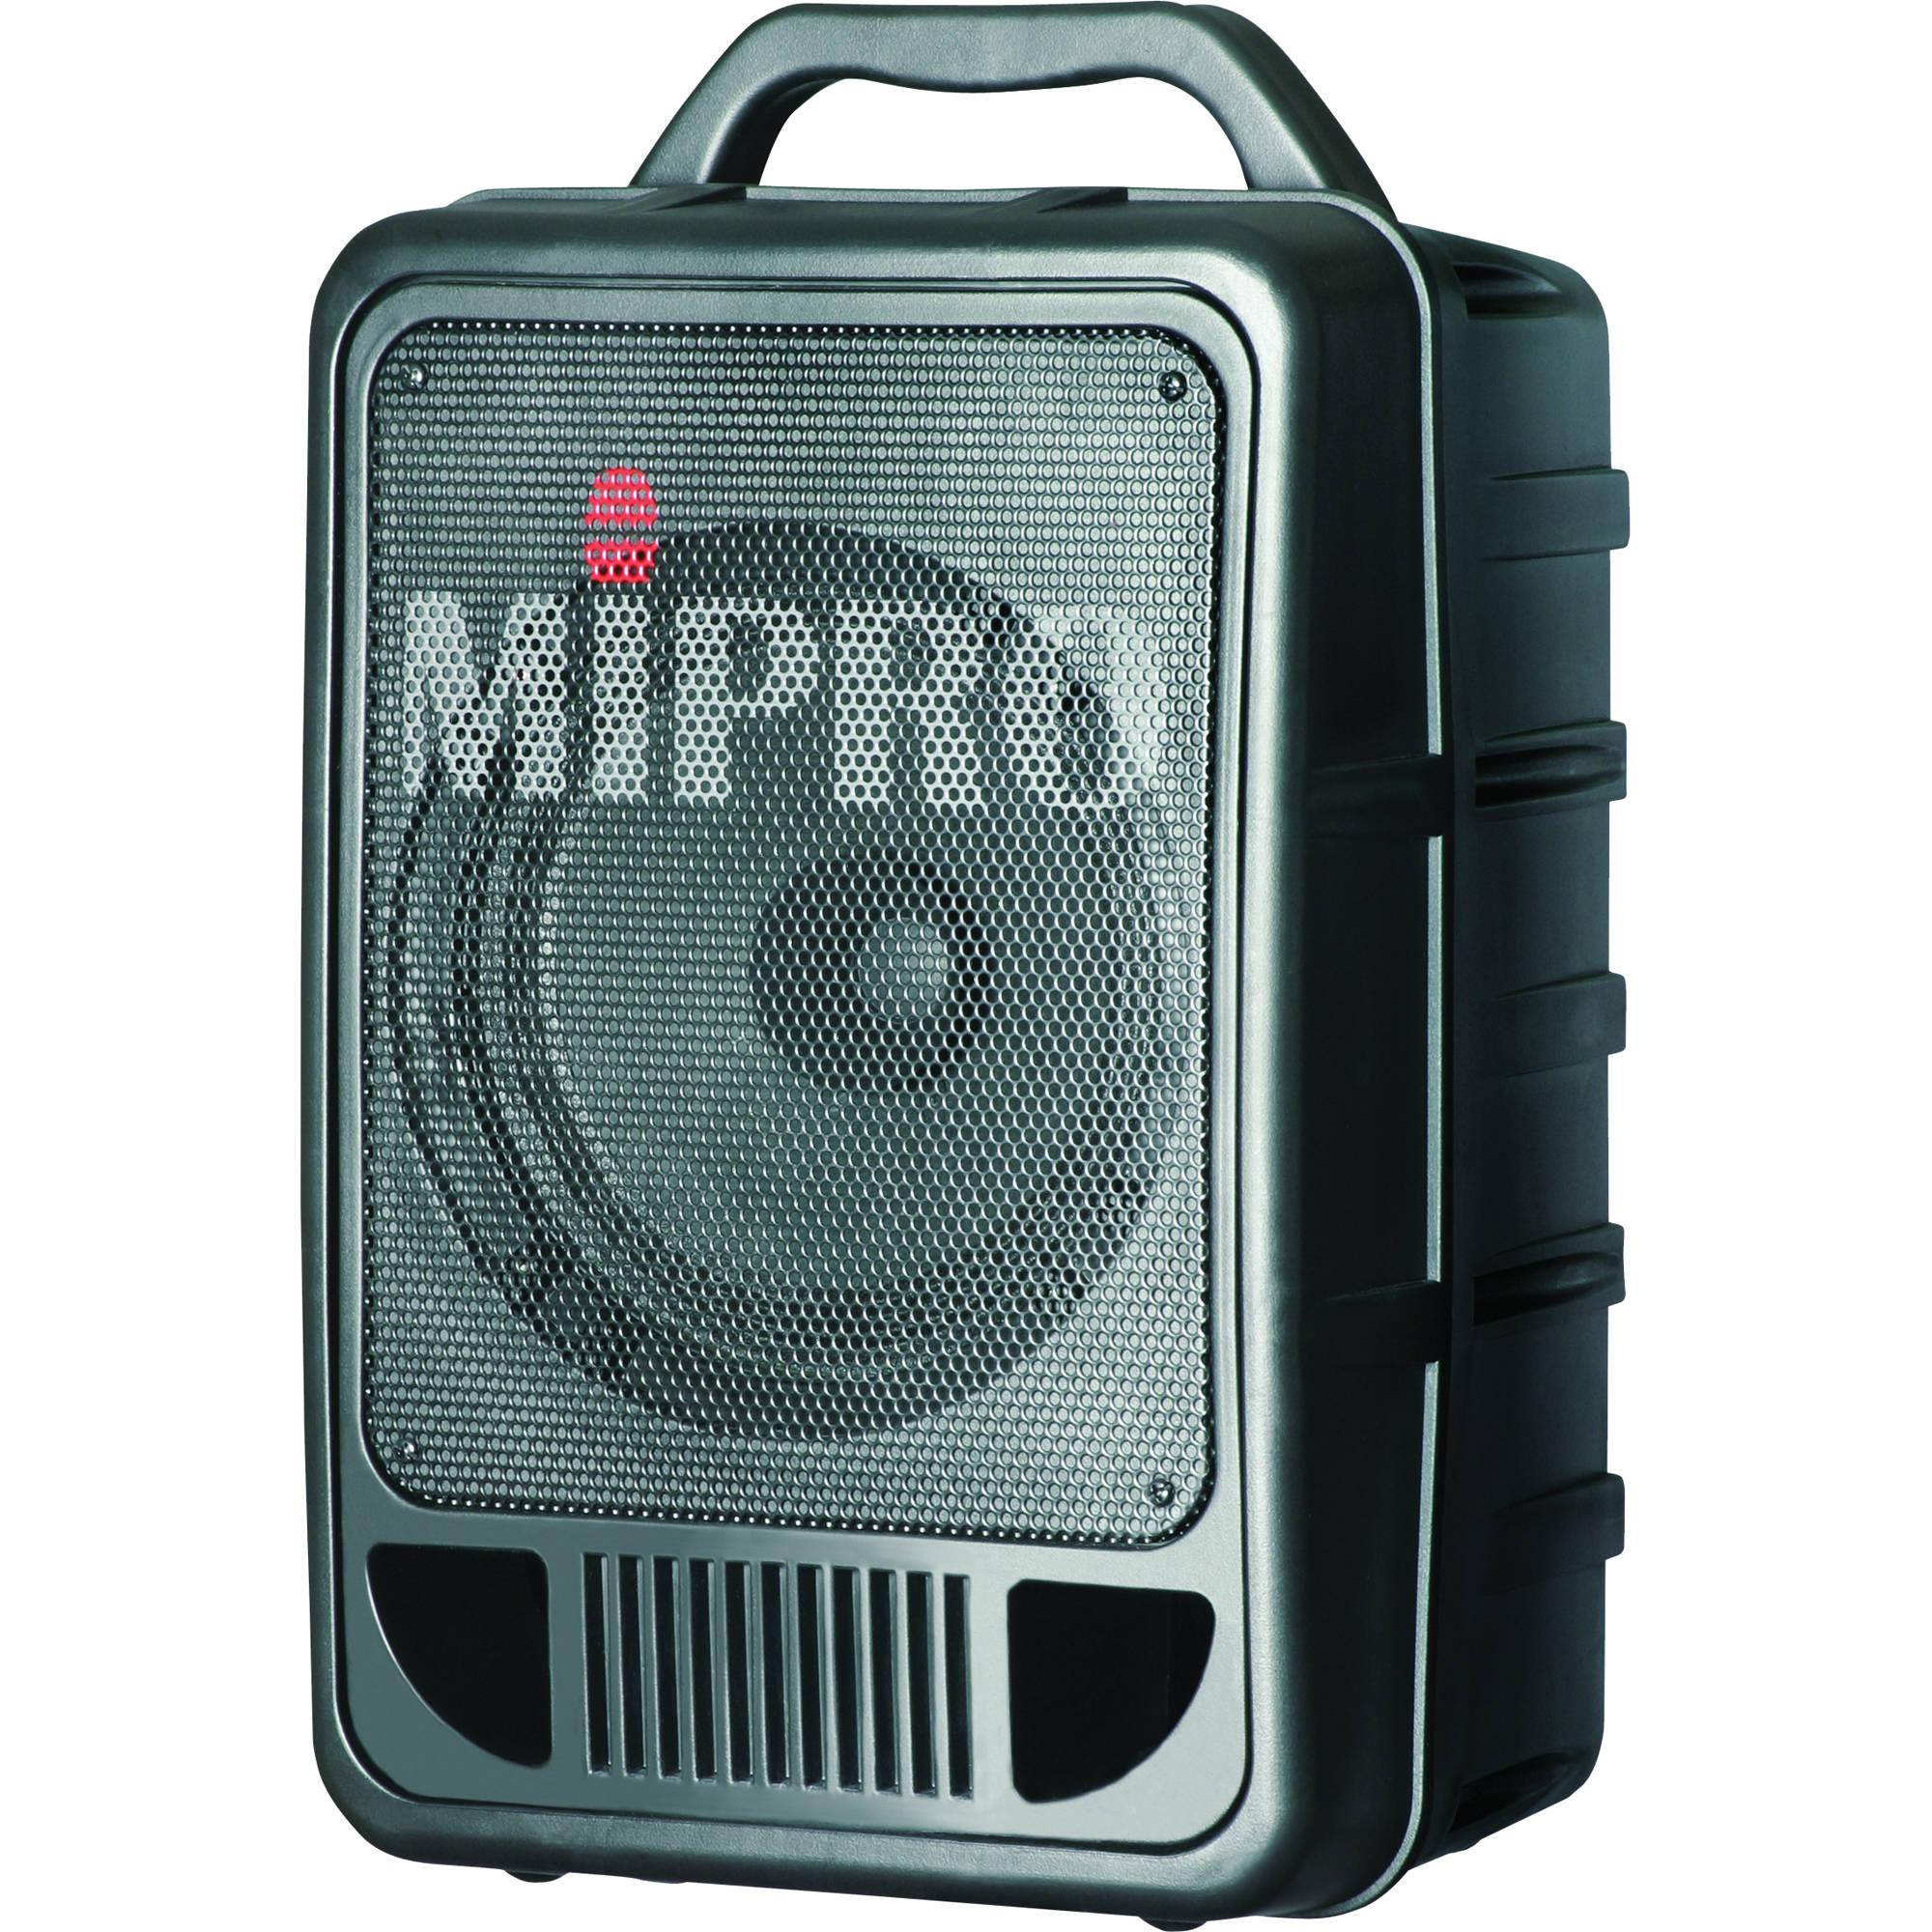 mipro ma 705padma portable wireless pa system ma705padma b h. Black Bedroom Furniture Sets. Home Design Ideas